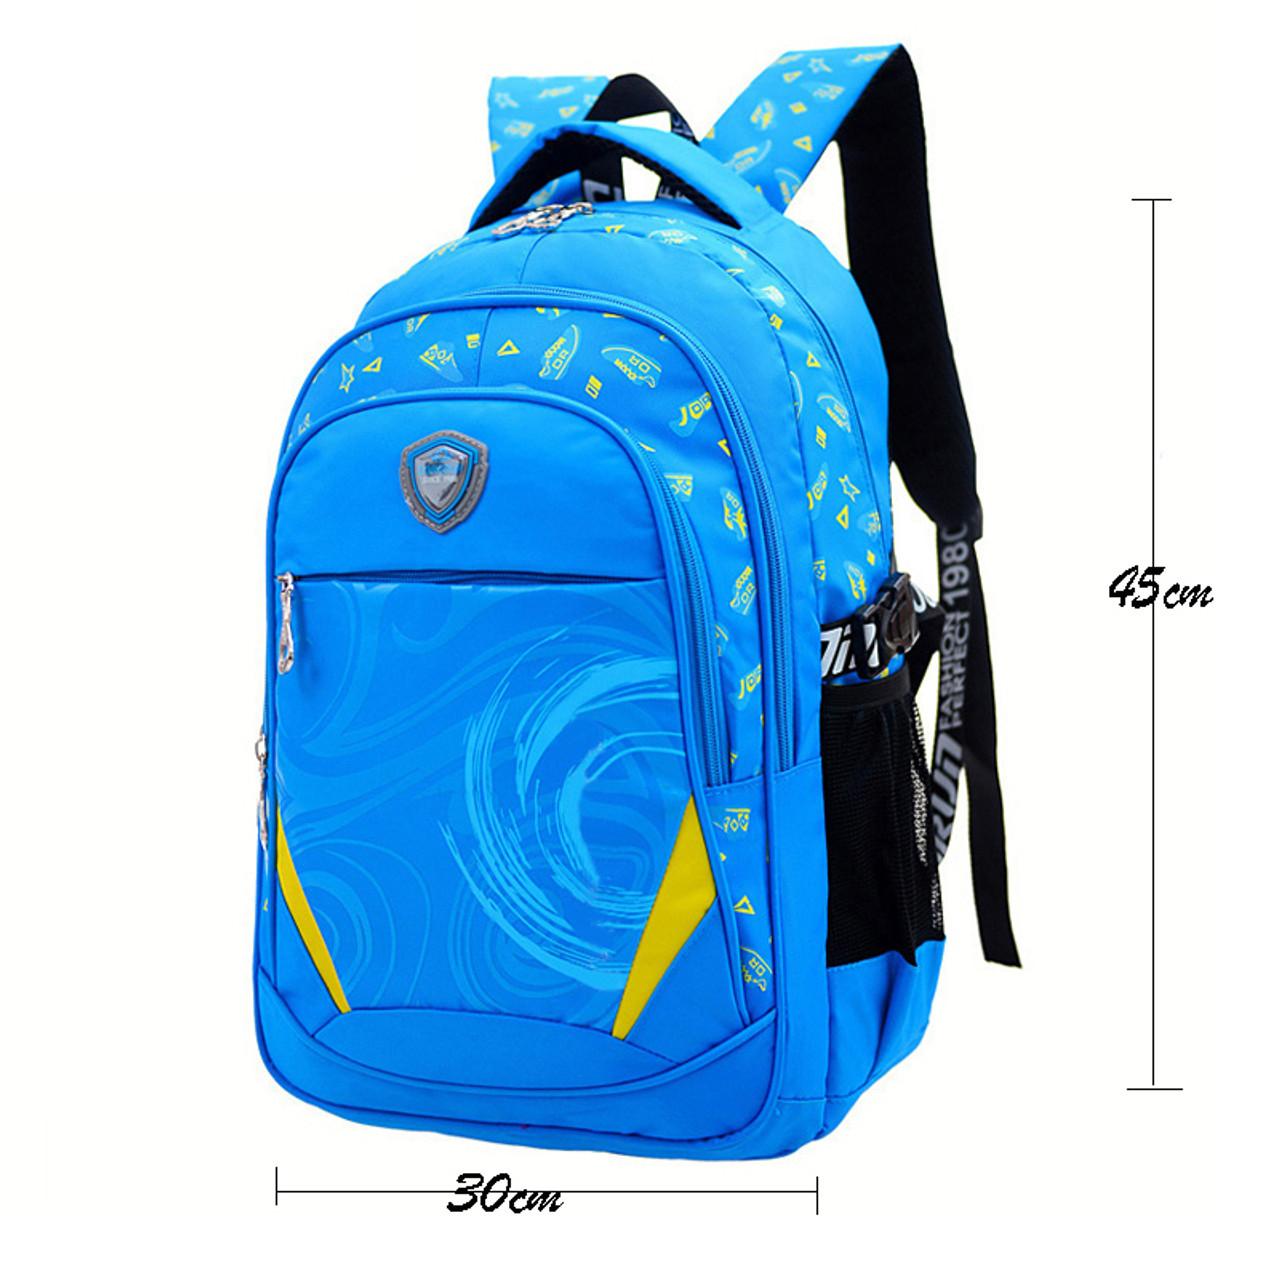 Infantil Bag Boys Children Primary Baijiawei Girls Backpacks Zip For Bags Backpack In Mochila School MqzVpSUG